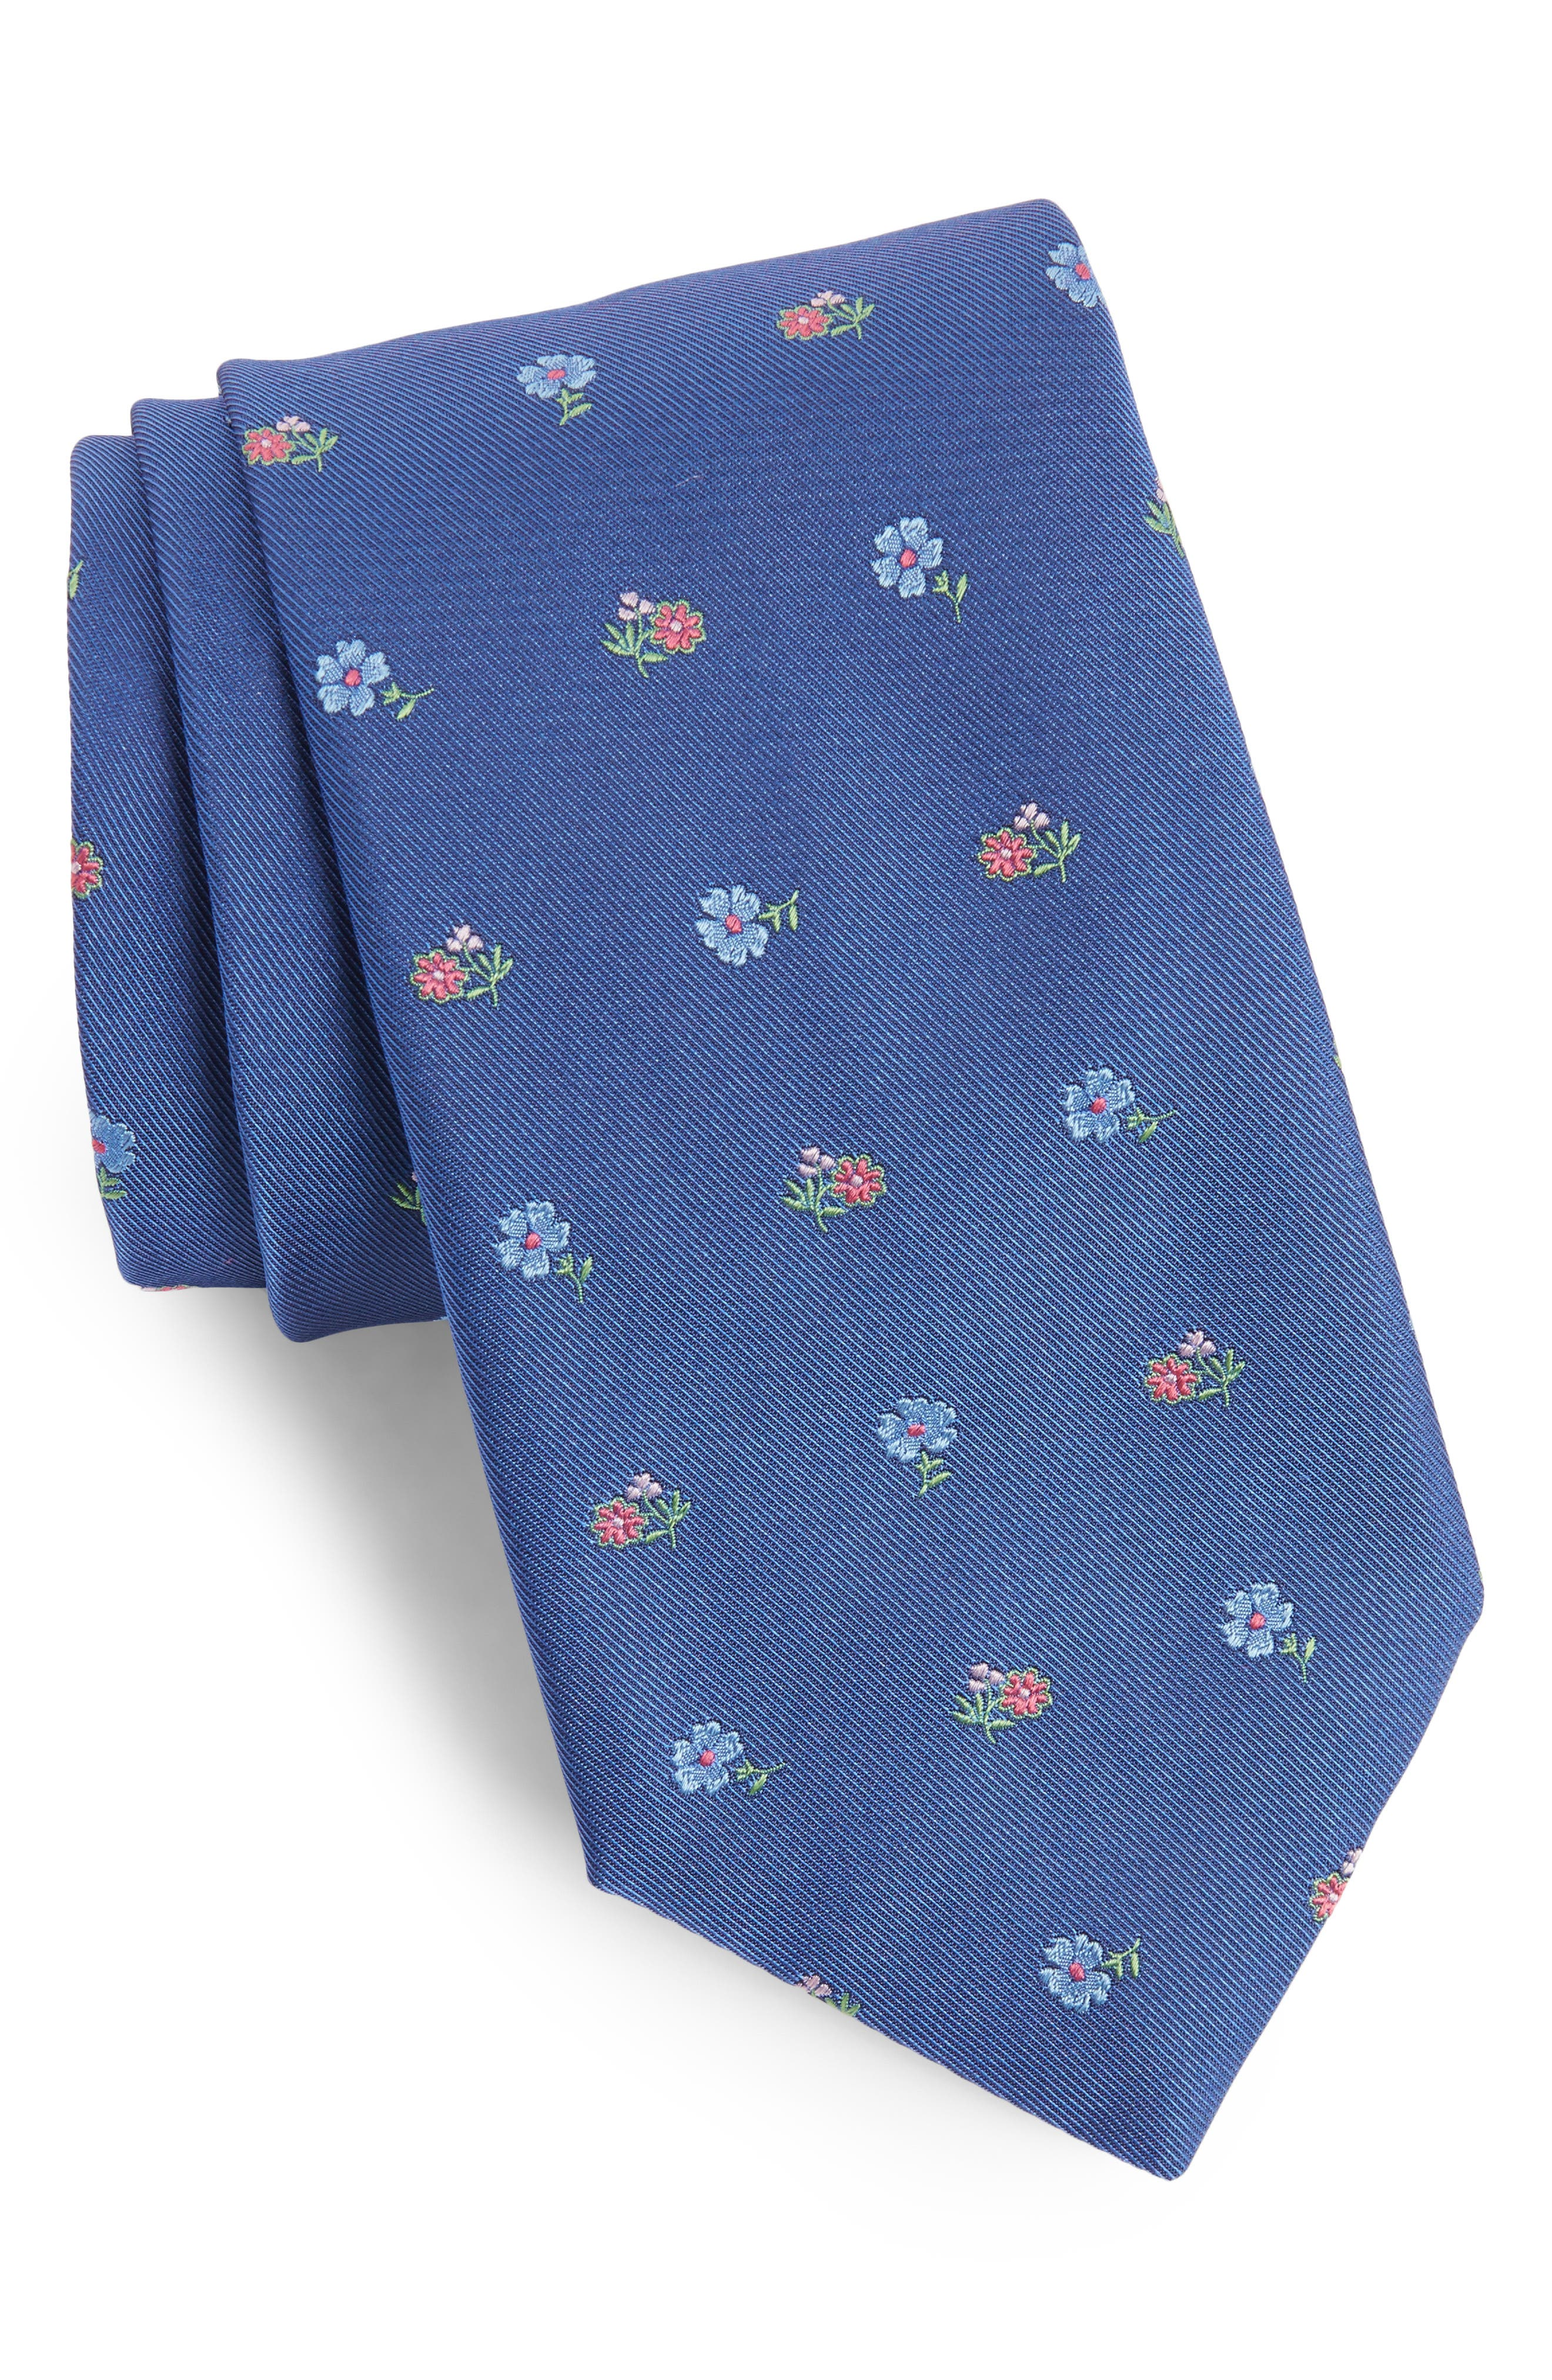 Main Image - Canali Floral Jacquard Silk Tie